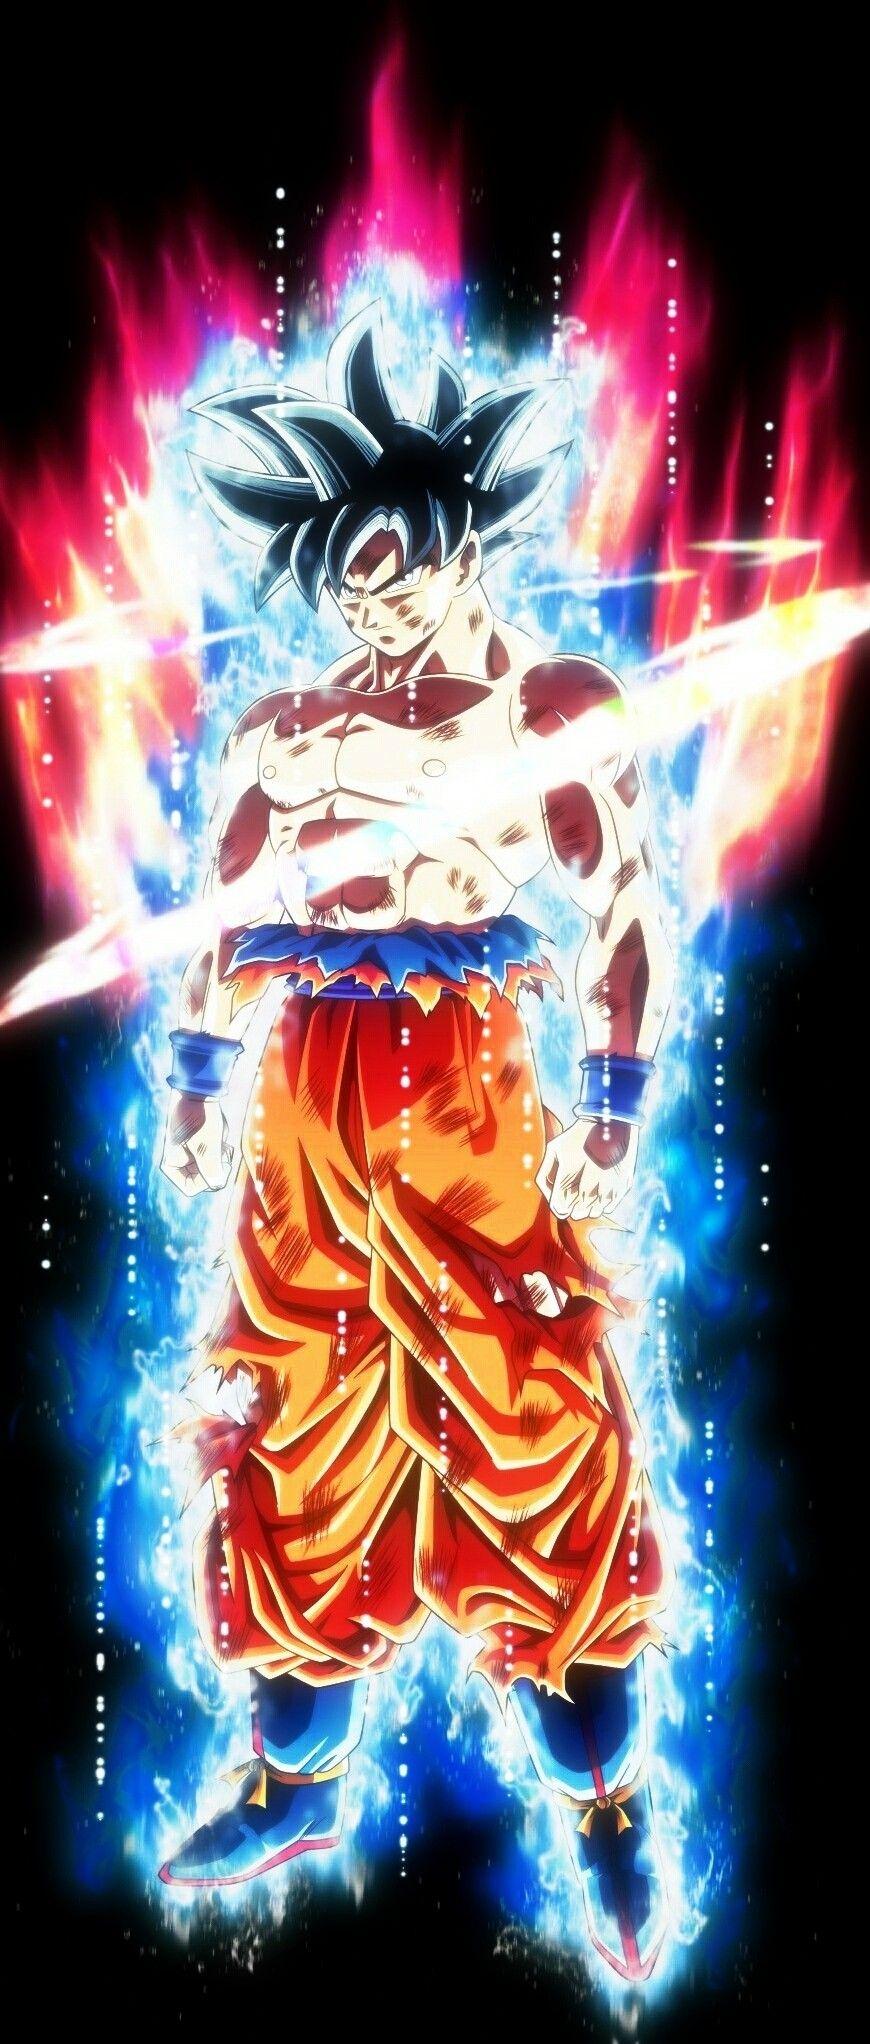 Goku Ultrainstinct In Dragon Ball Super Dragon Ball Wallpapers Dragon Ball Goku Dragon Ball